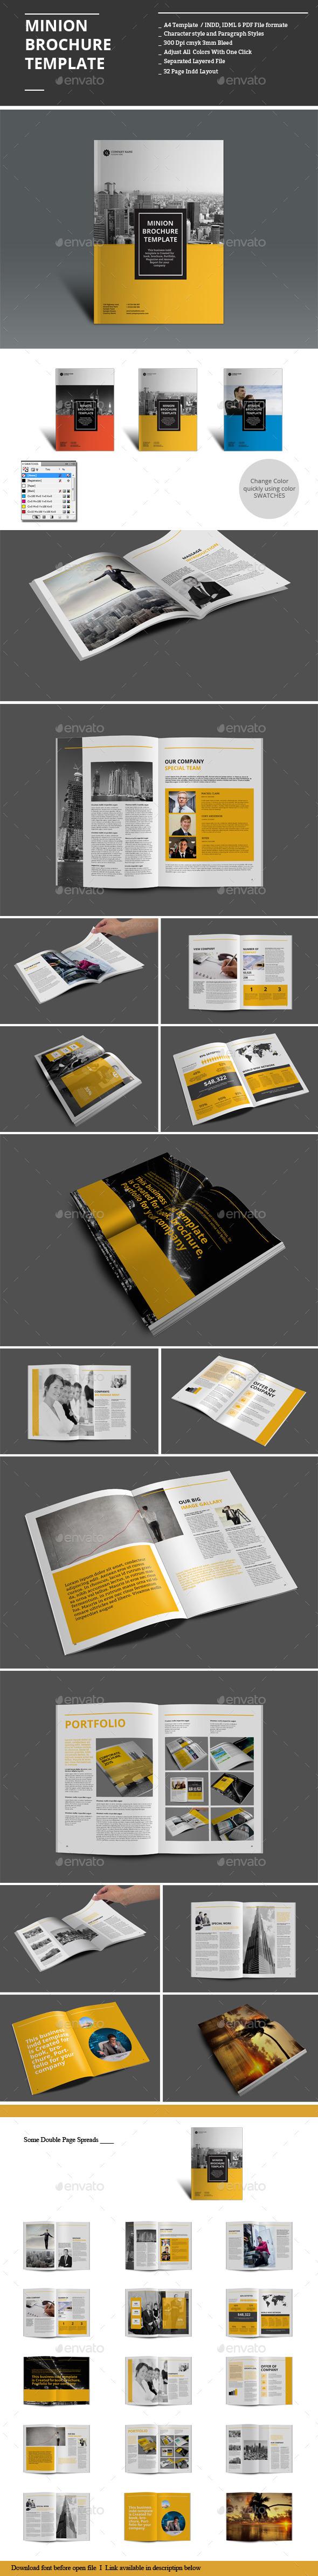 Minion Brochure Templates | Folleto corporativo, Folletos y Arte